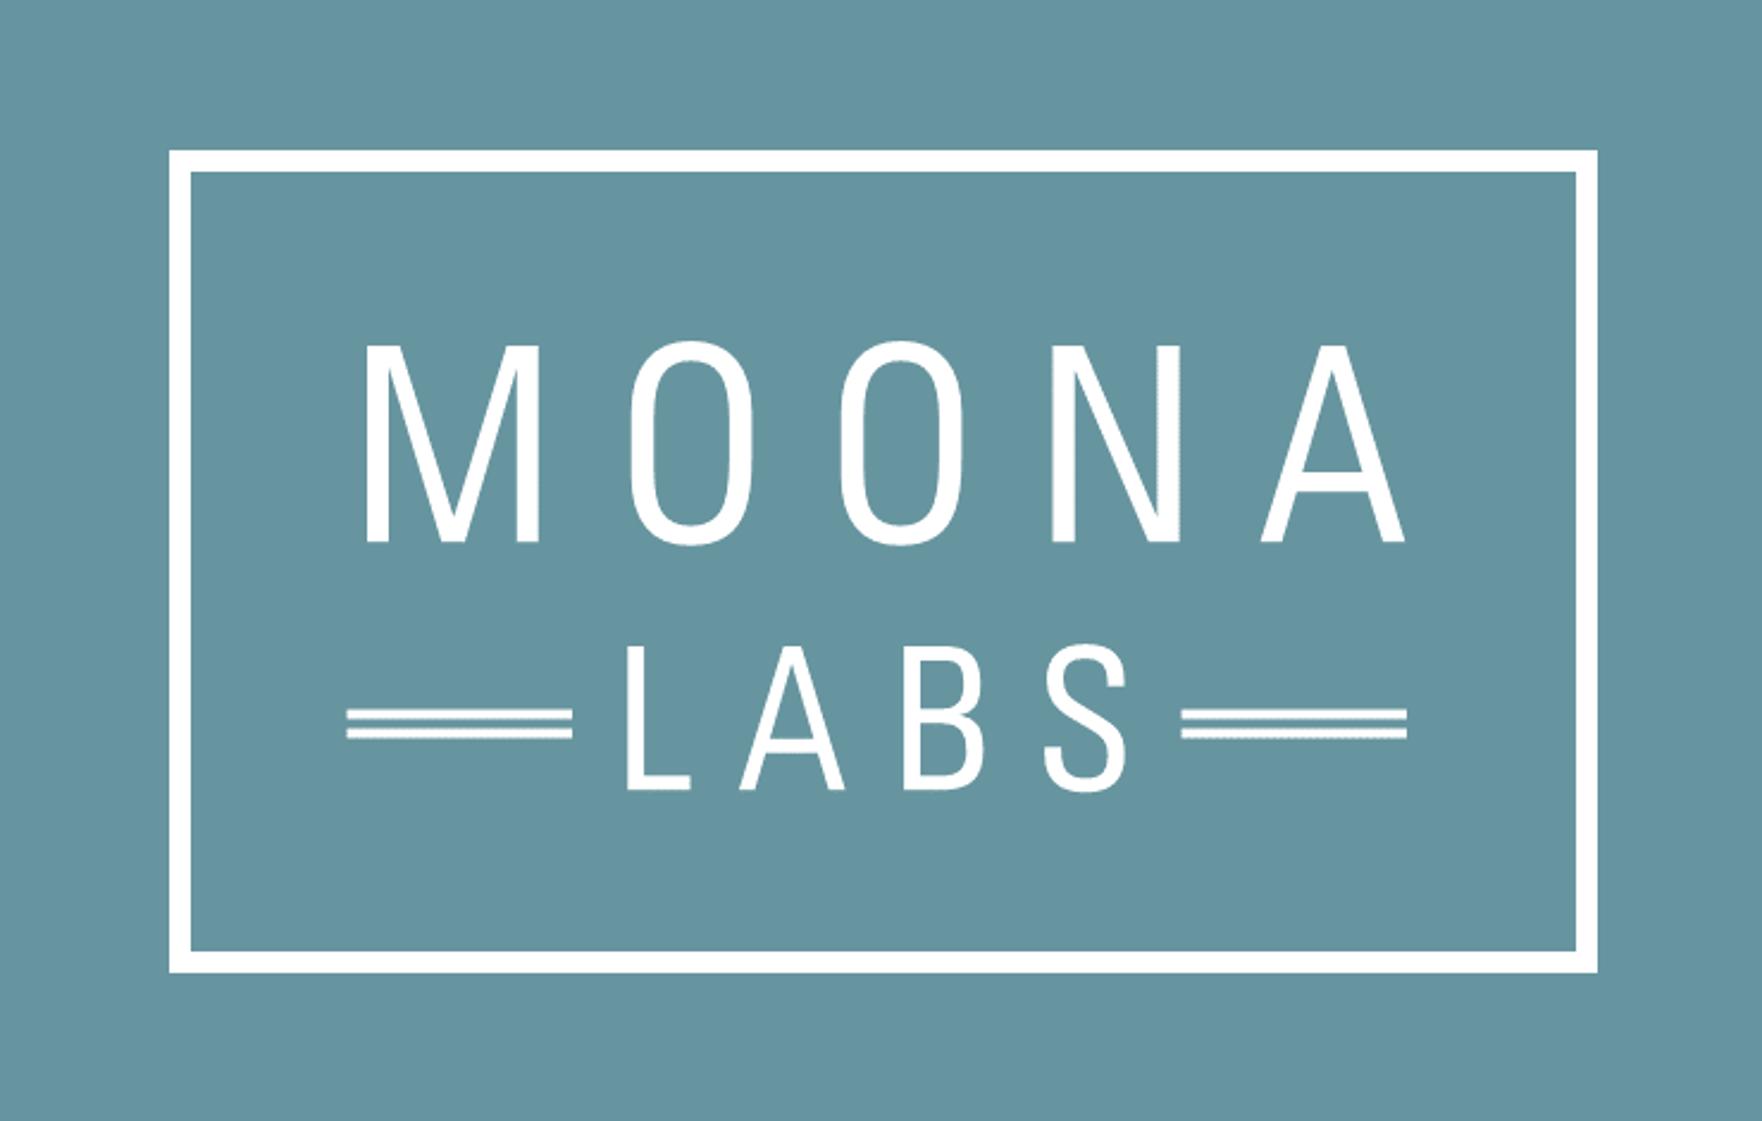 Moonalabs Ltd